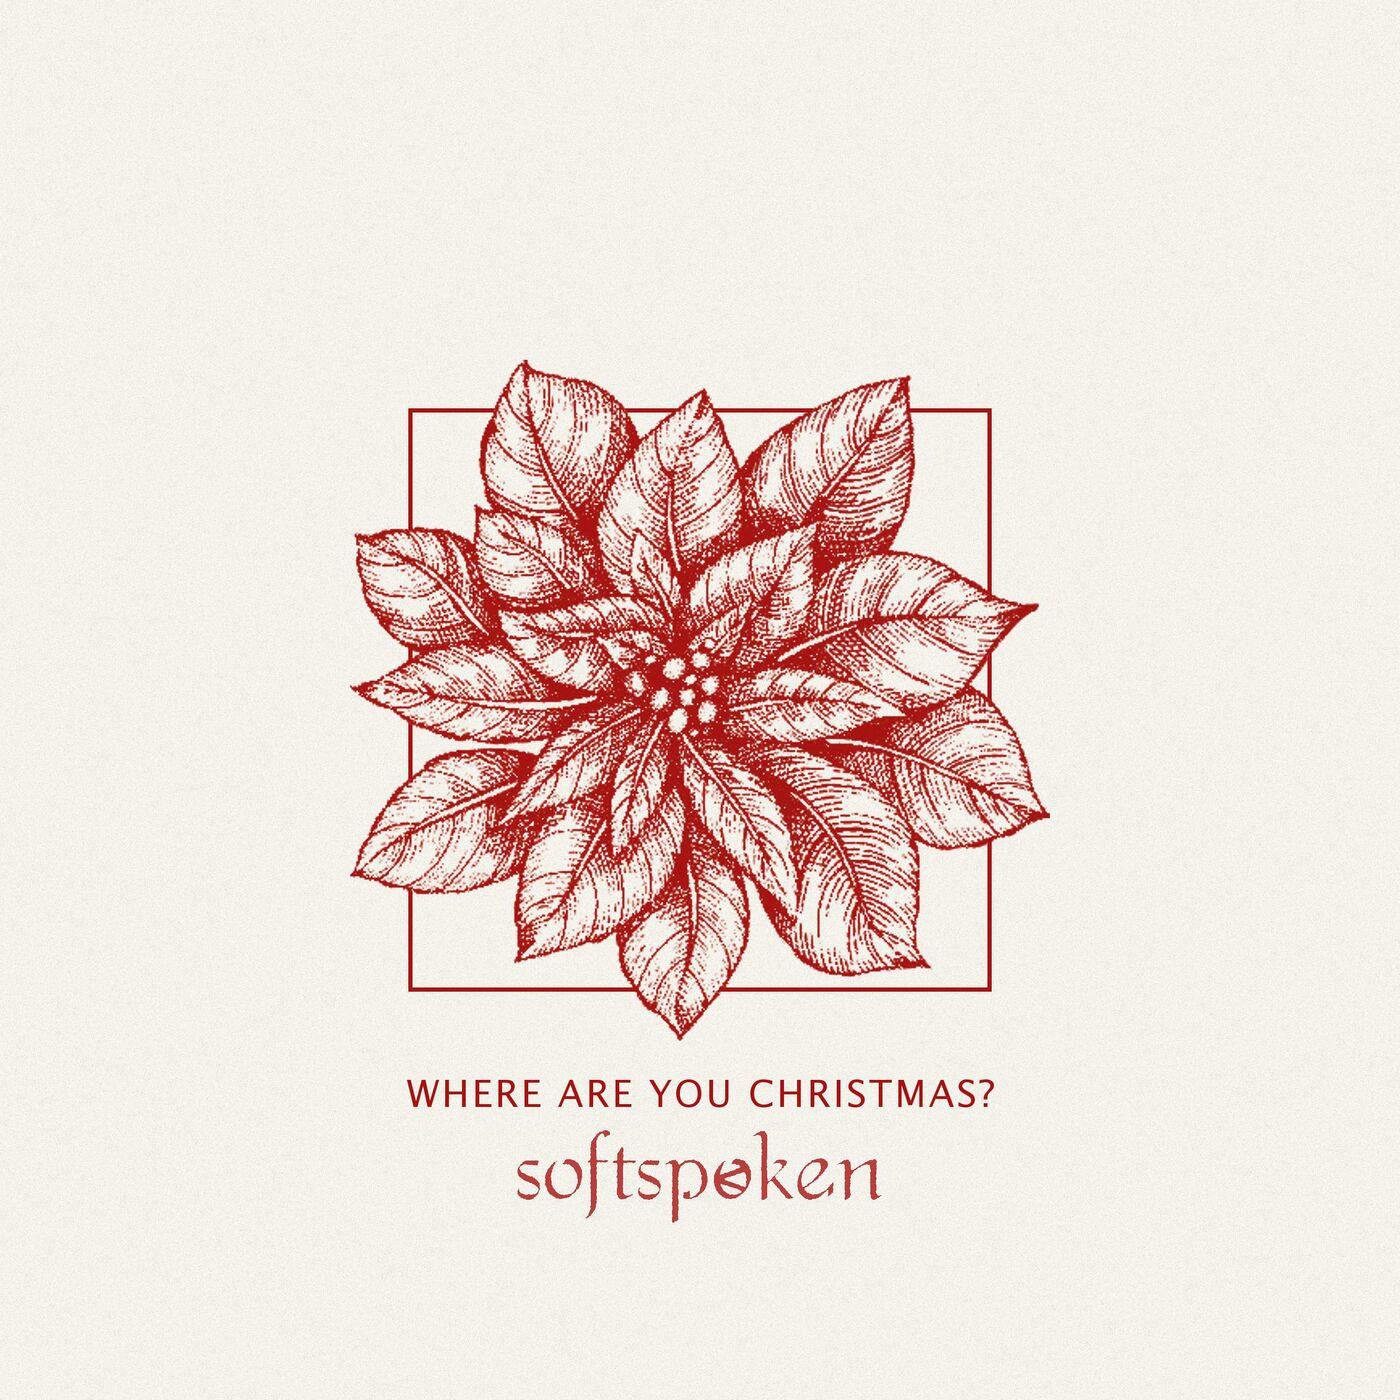 Softspoken - Where Are You Christmas? [single] (2019)